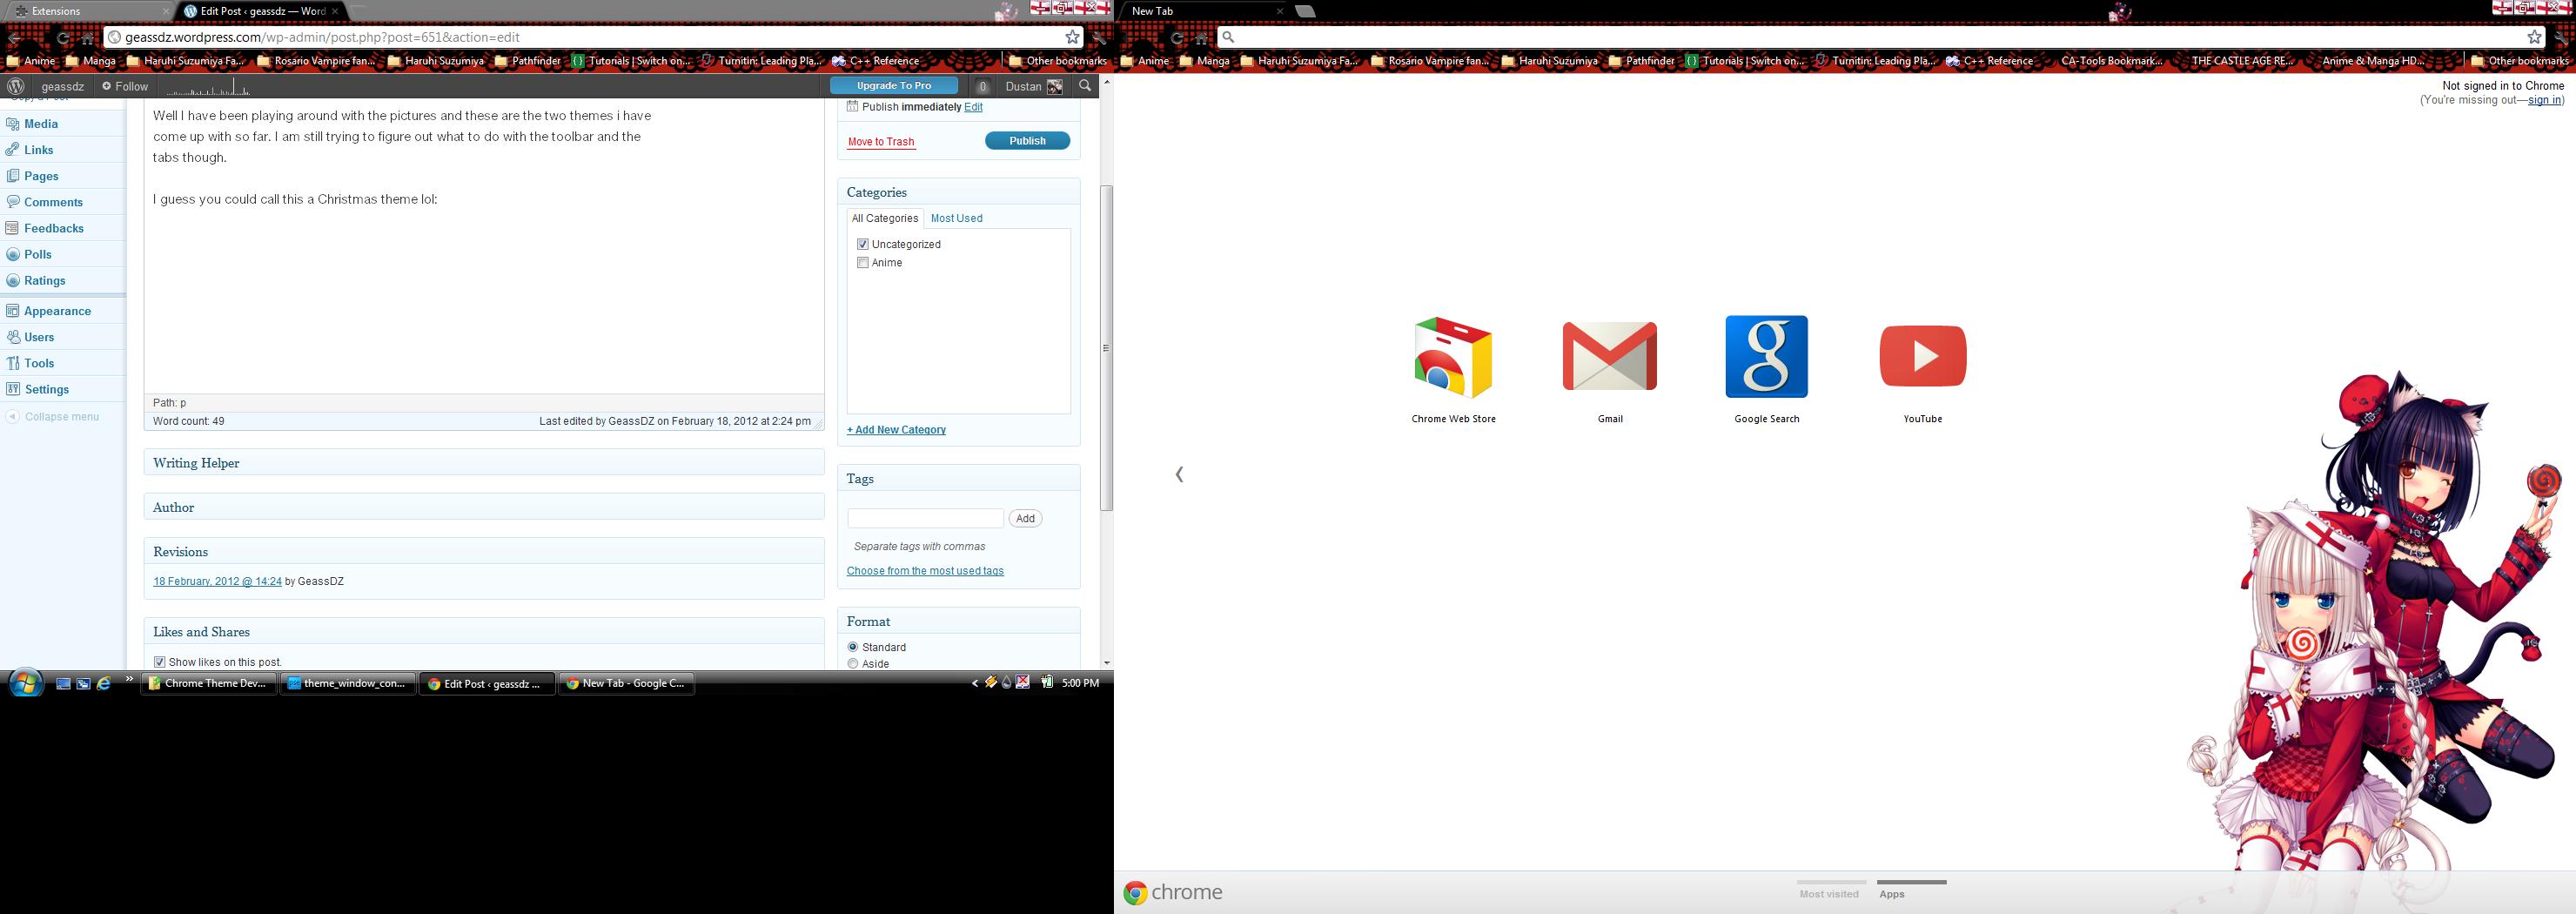 Gmail theme anime - I